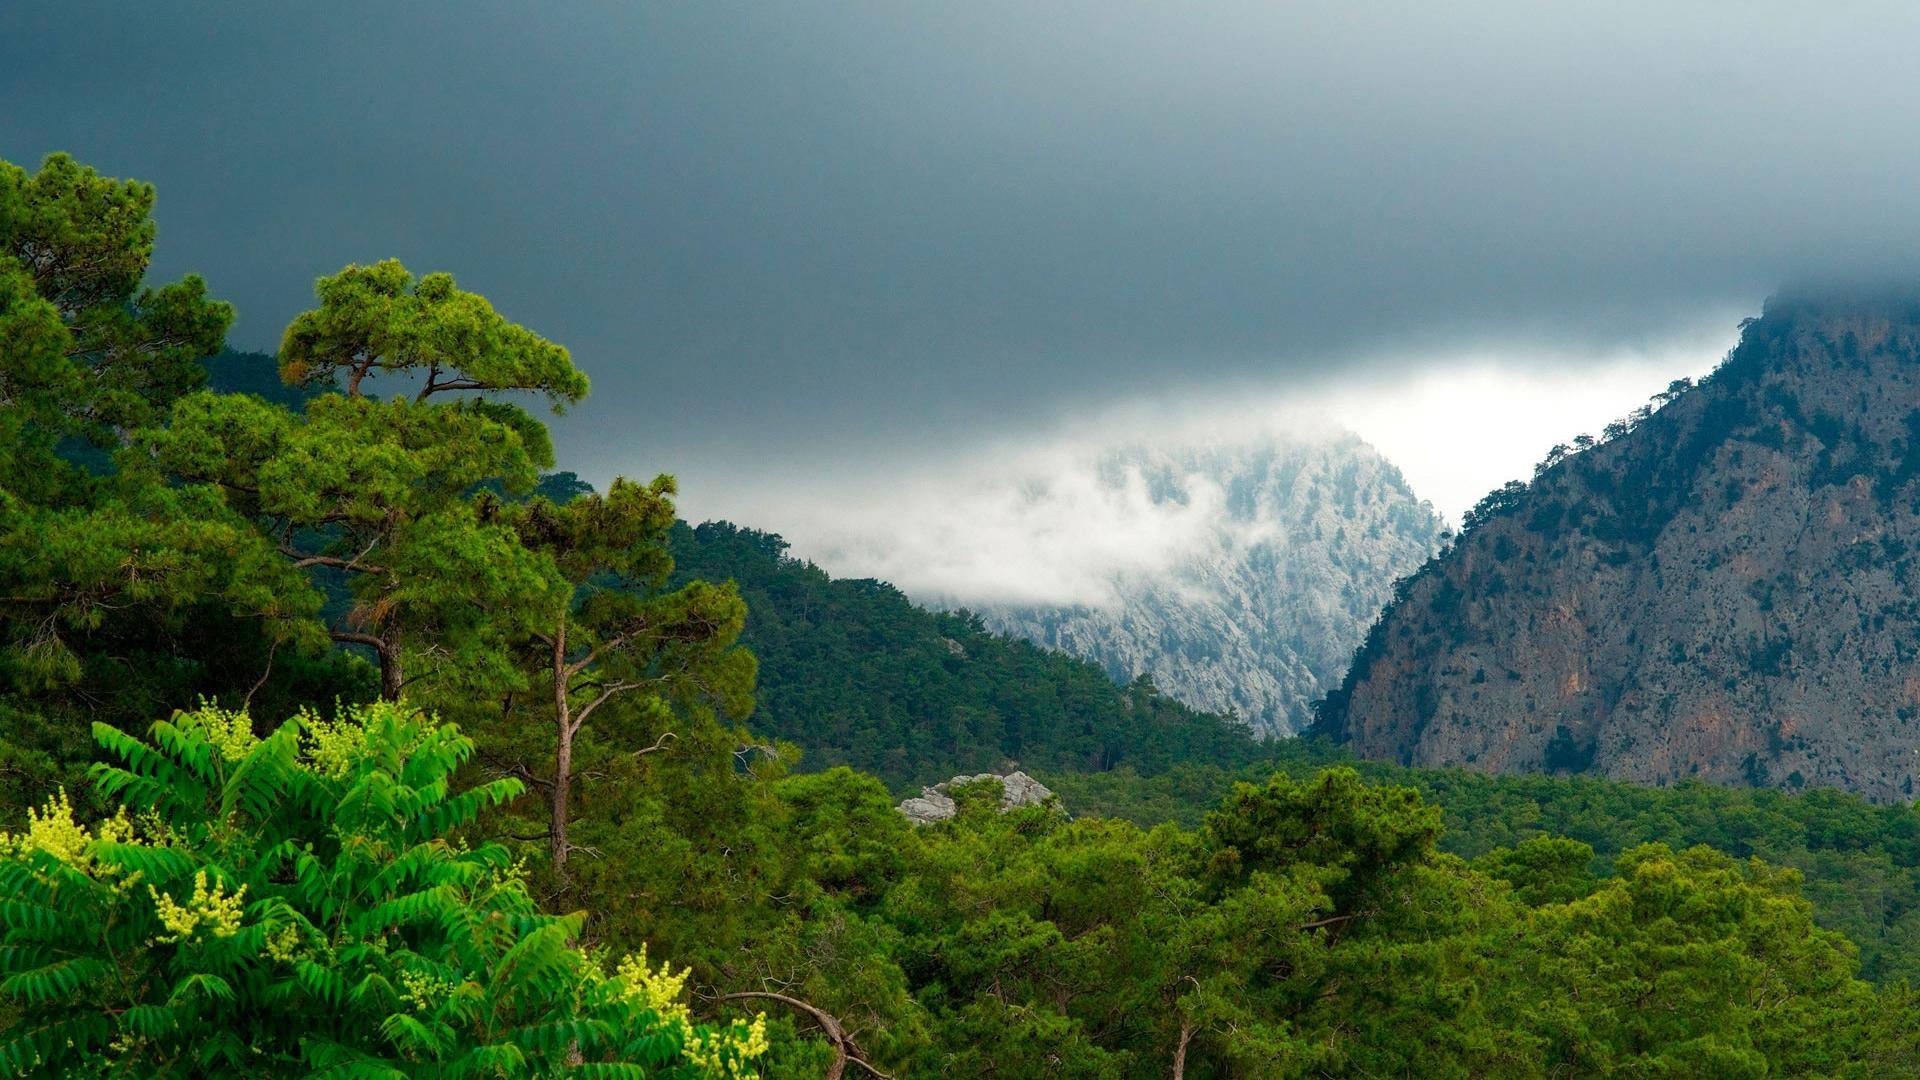 Hd beautiful mountains scenery desktop backgrounds wide  wallpapers:1280×800,1440×900,1680×1050 –